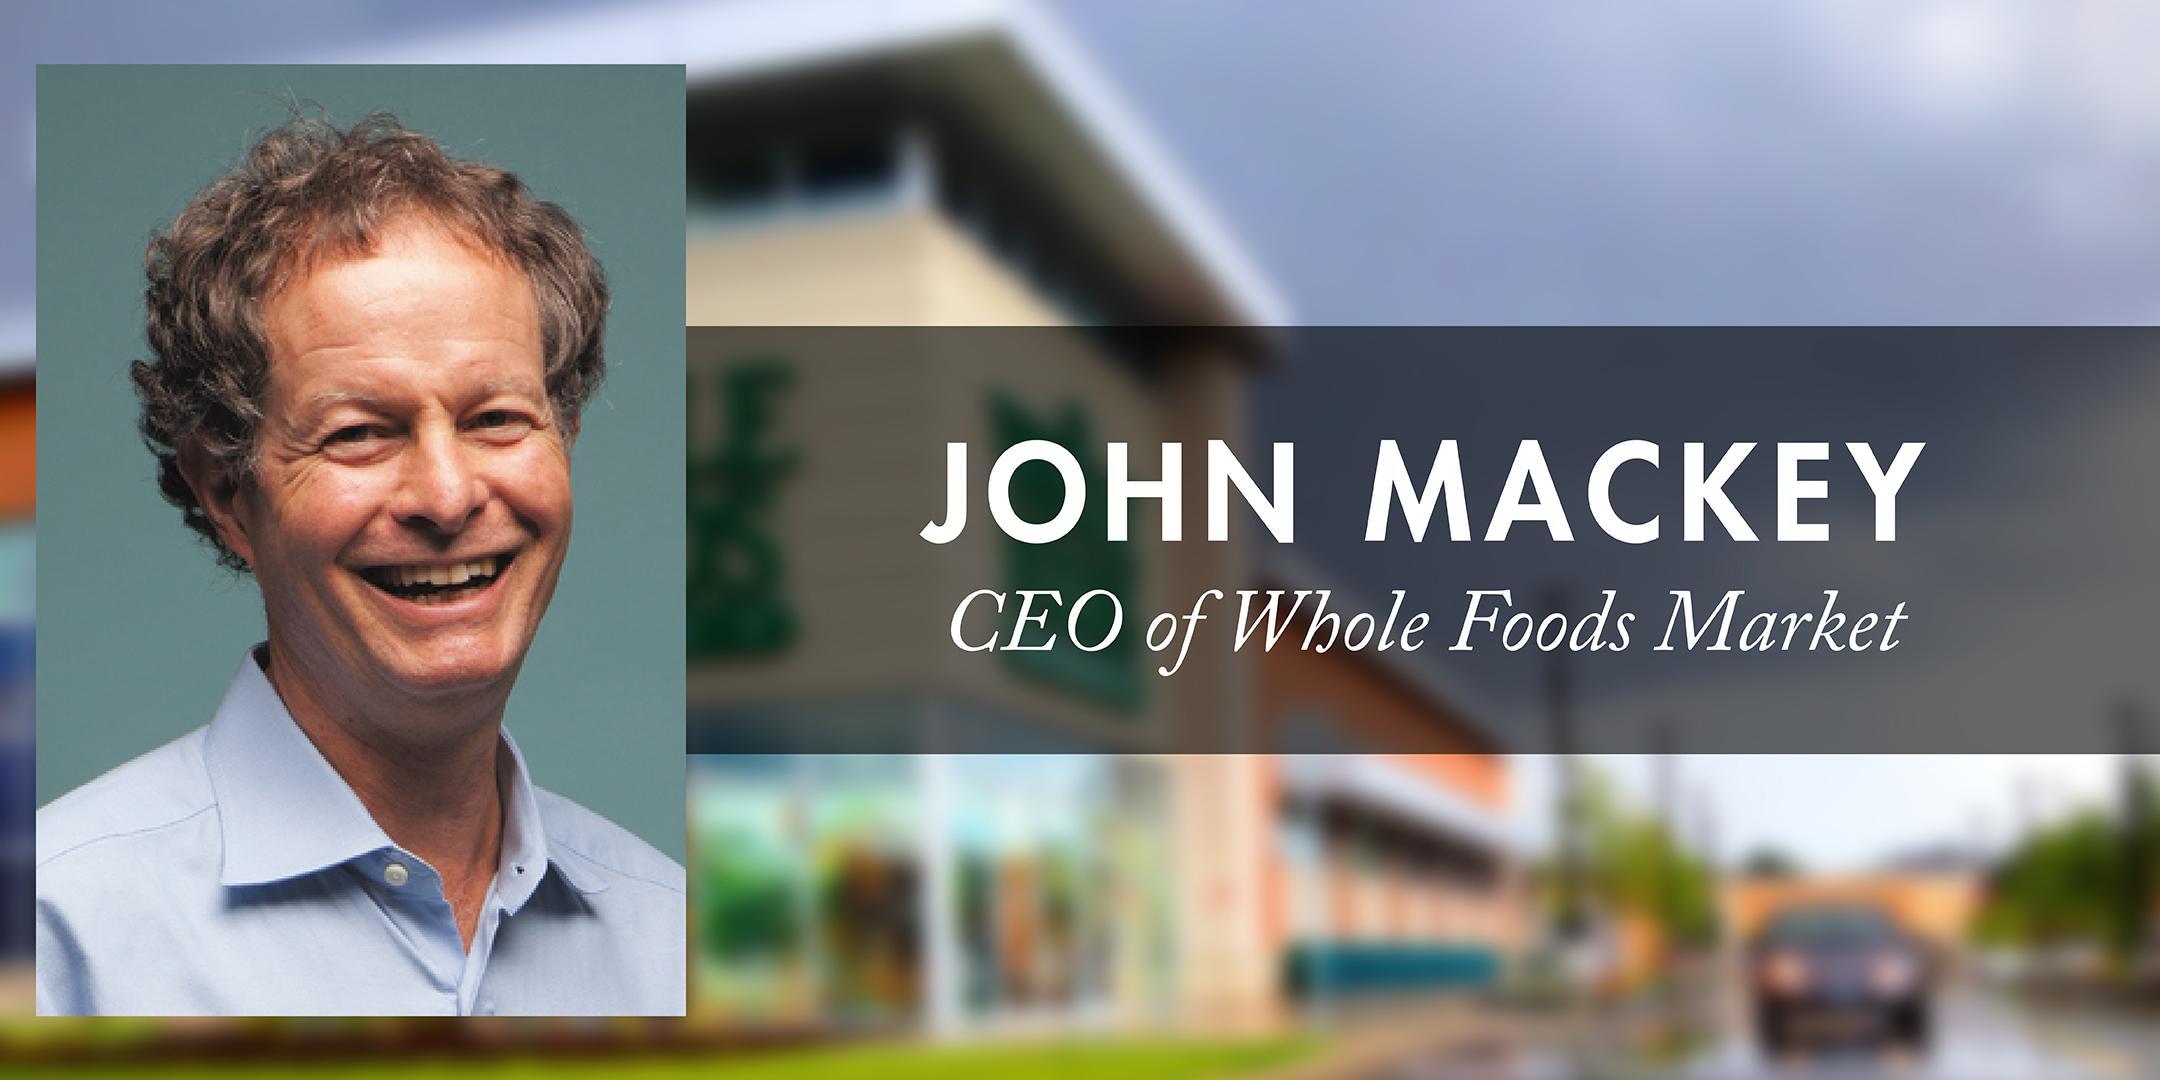 John Mackey, Co-Founder and CEO of Whole Food